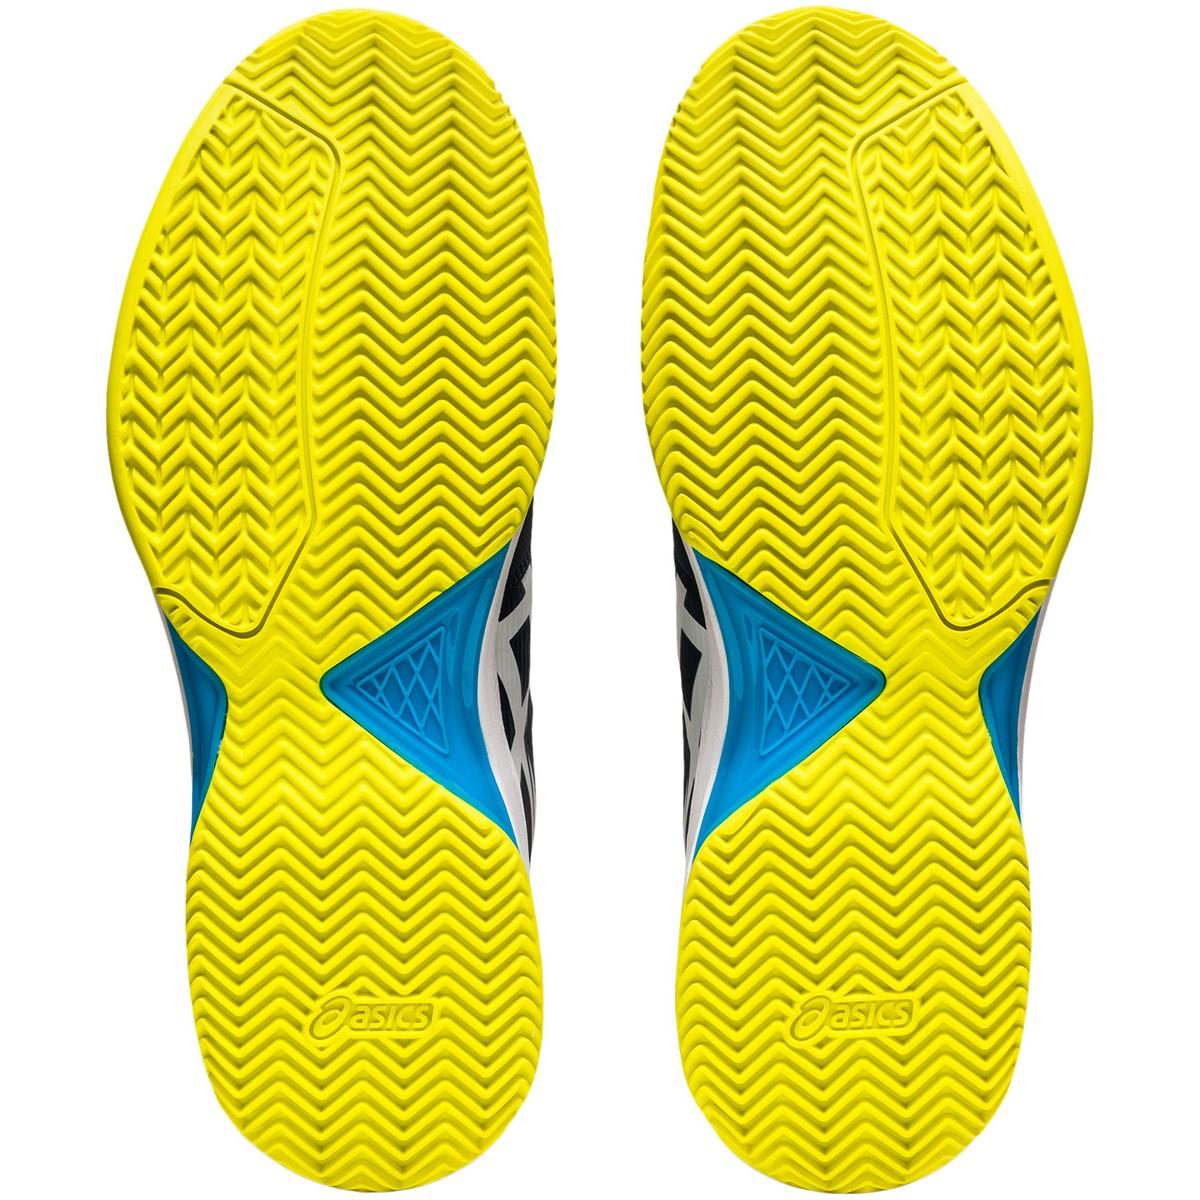 CHAUSSURES ASICS GEL PRO PADEL/TERRE BATTUE - ASICS - Chaussures ...